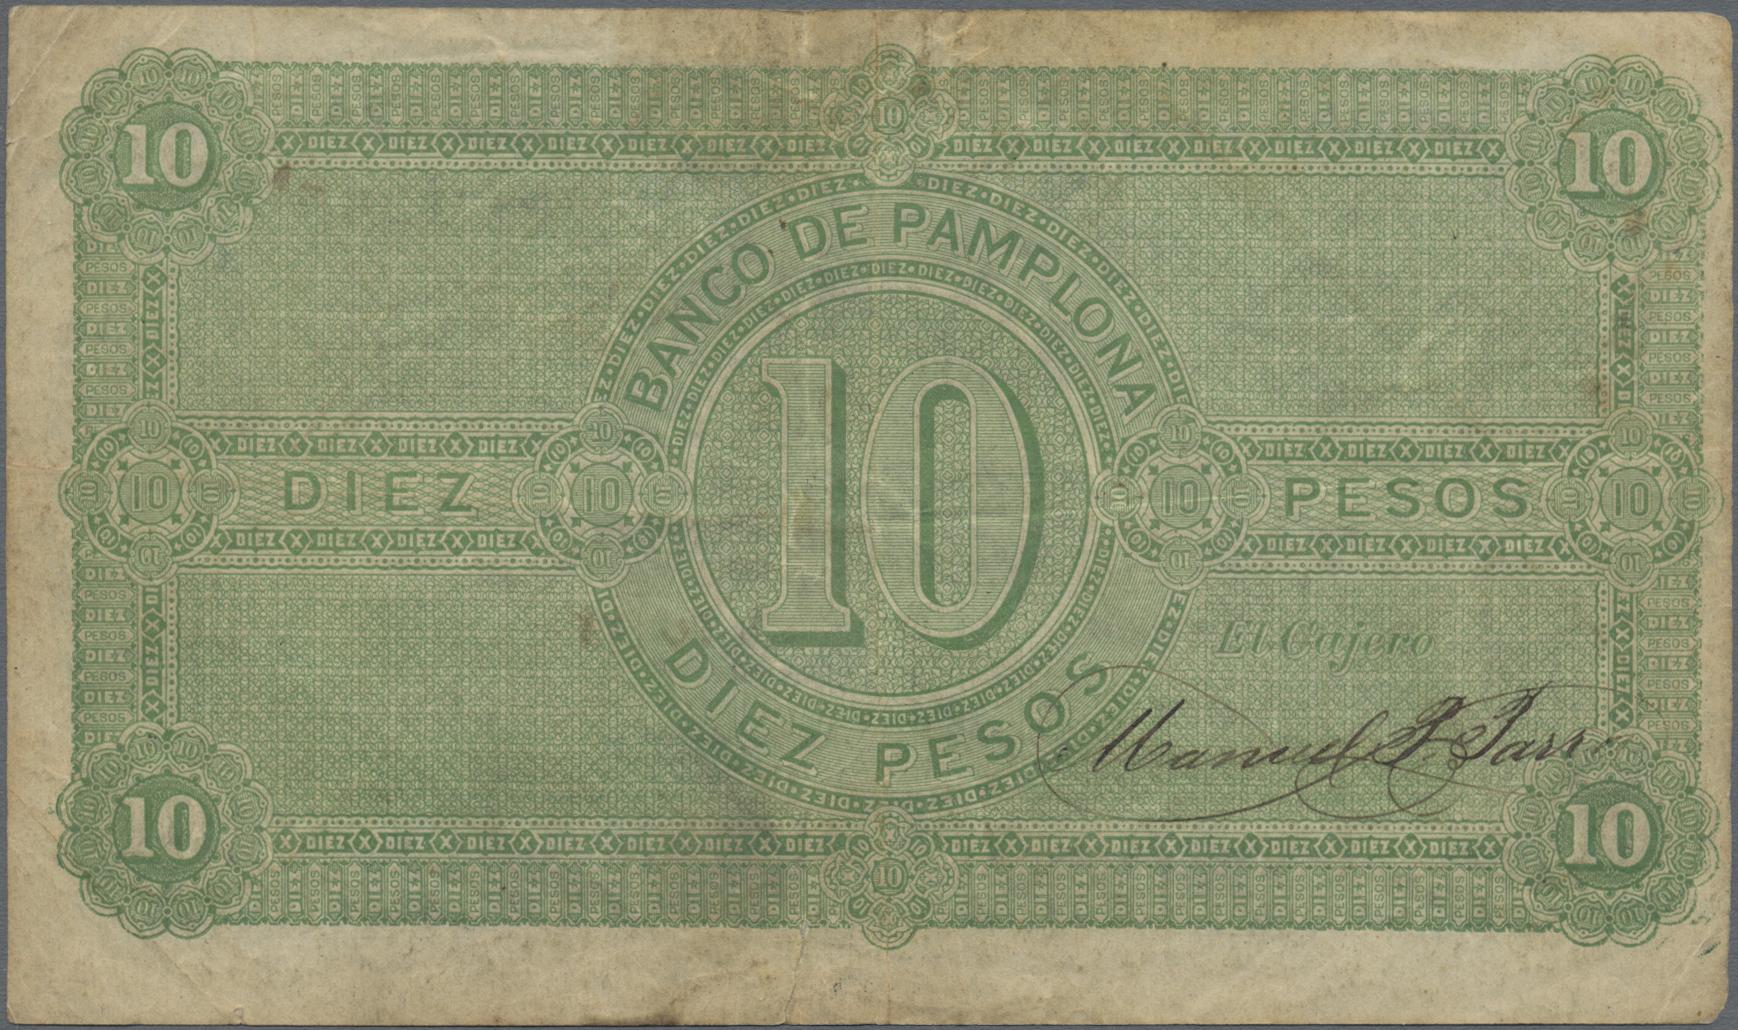 Lot 00149 - Colombia / Kolumbien | Banknoten  -  Auktionshaus Christoph Gärtner GmbH & Co. KG Sale #48 The Banknotes